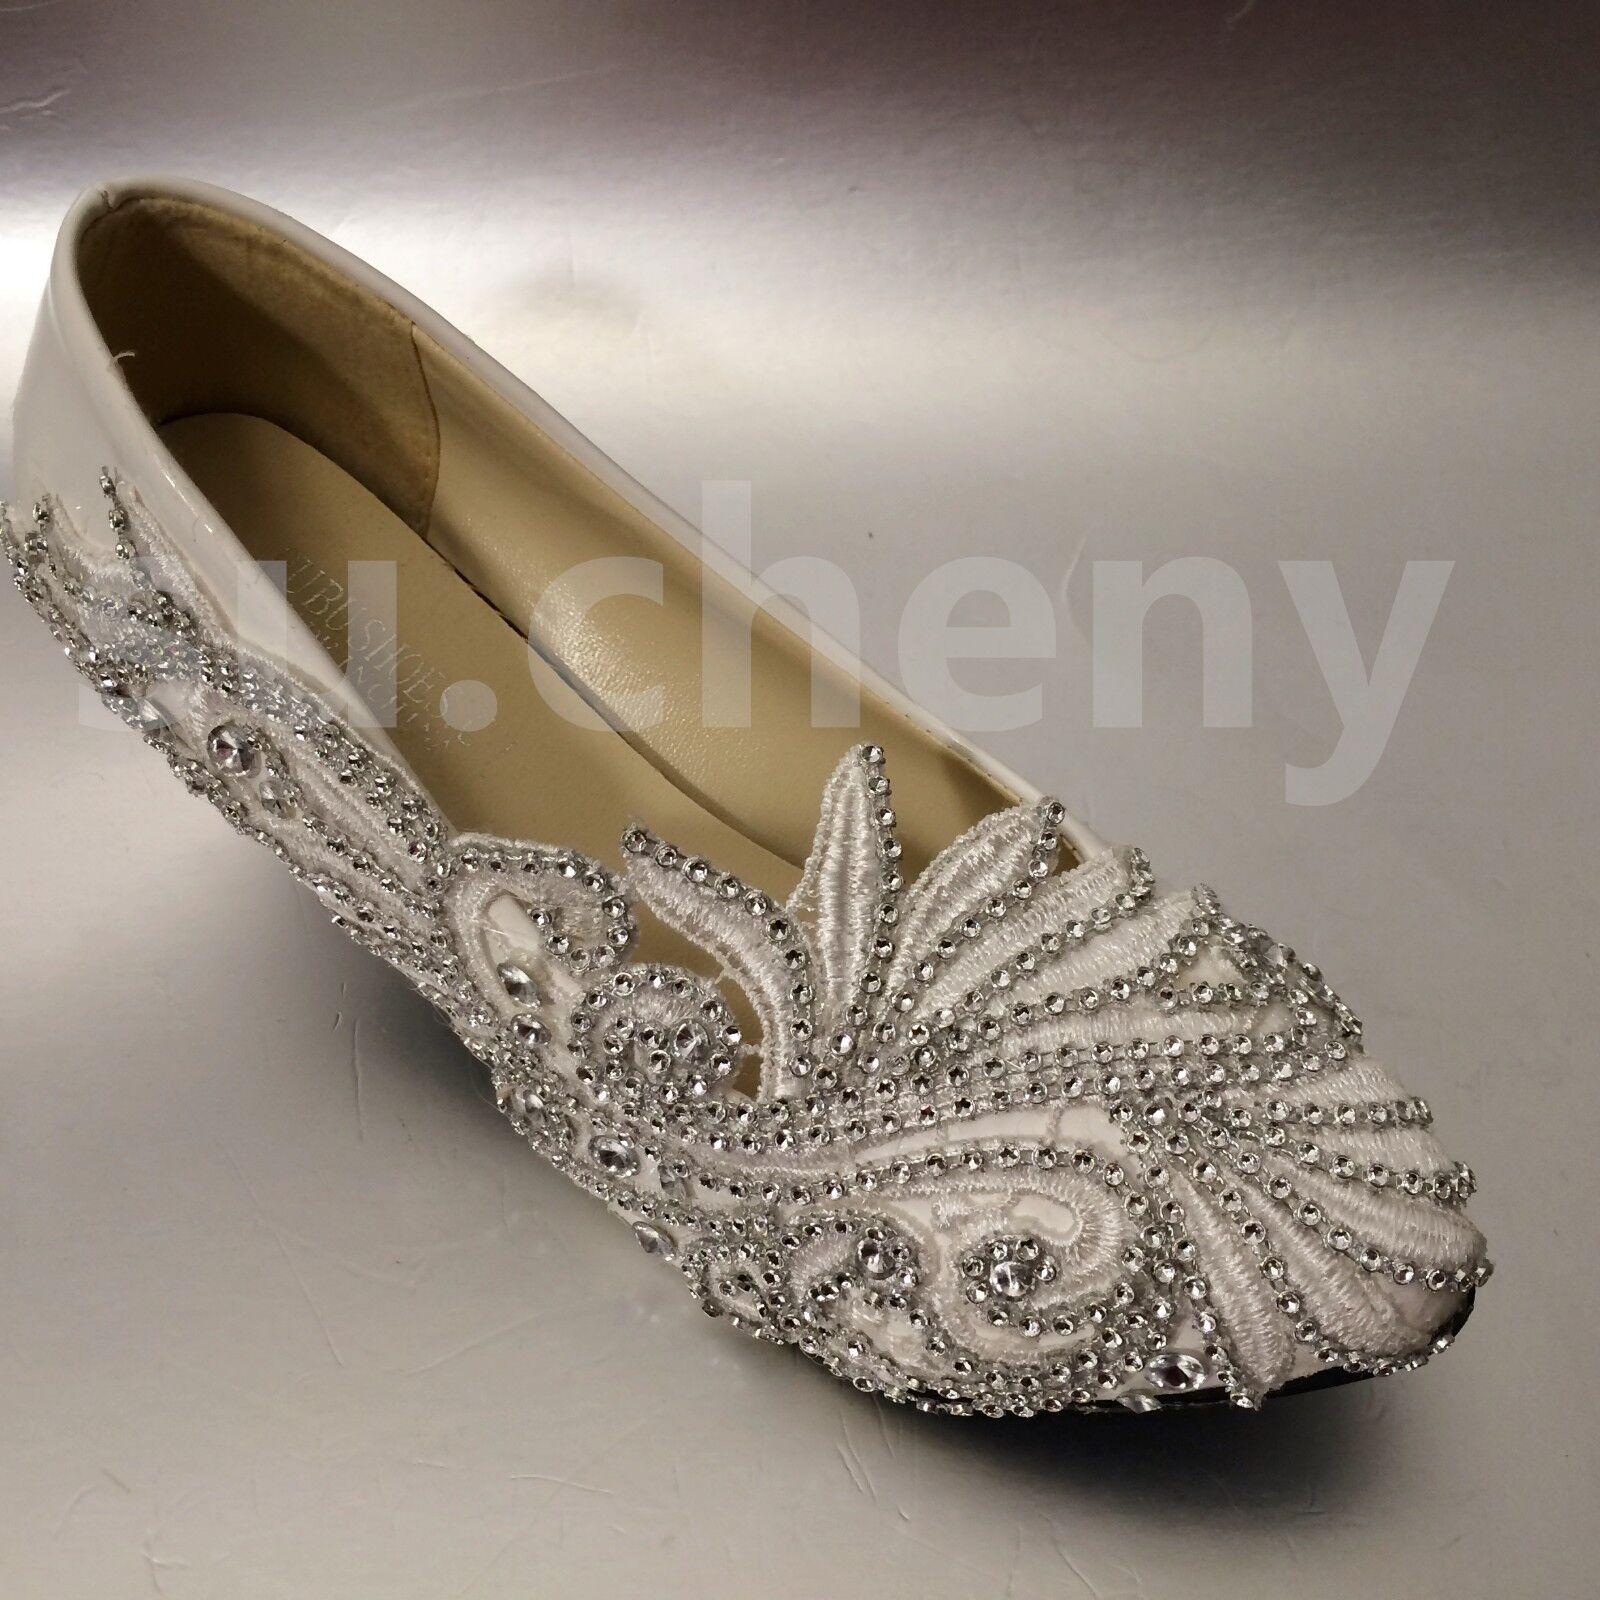 "Su.cheny 2"" 3  4 4 4  Lace blanc light ivory rhinestones Wedding Bridal heels chaussures 0c37b3"